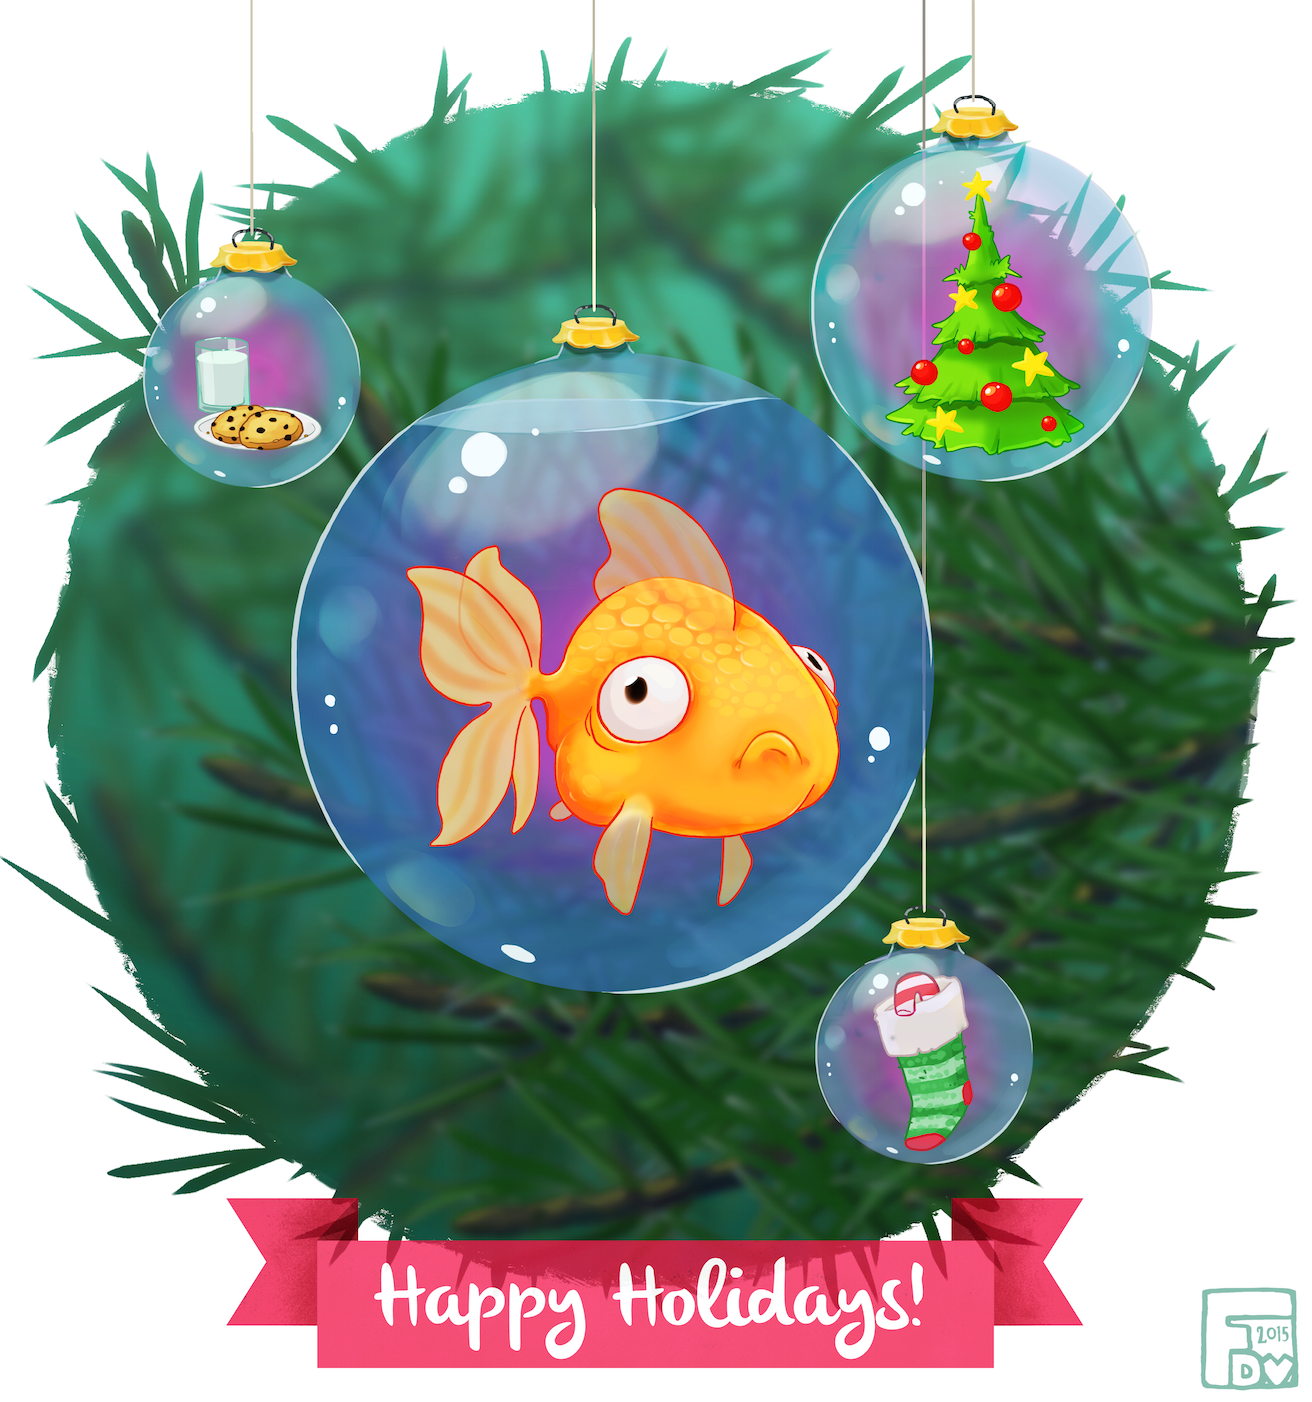 happy holidays 2015 - Christmas Holiday 2015